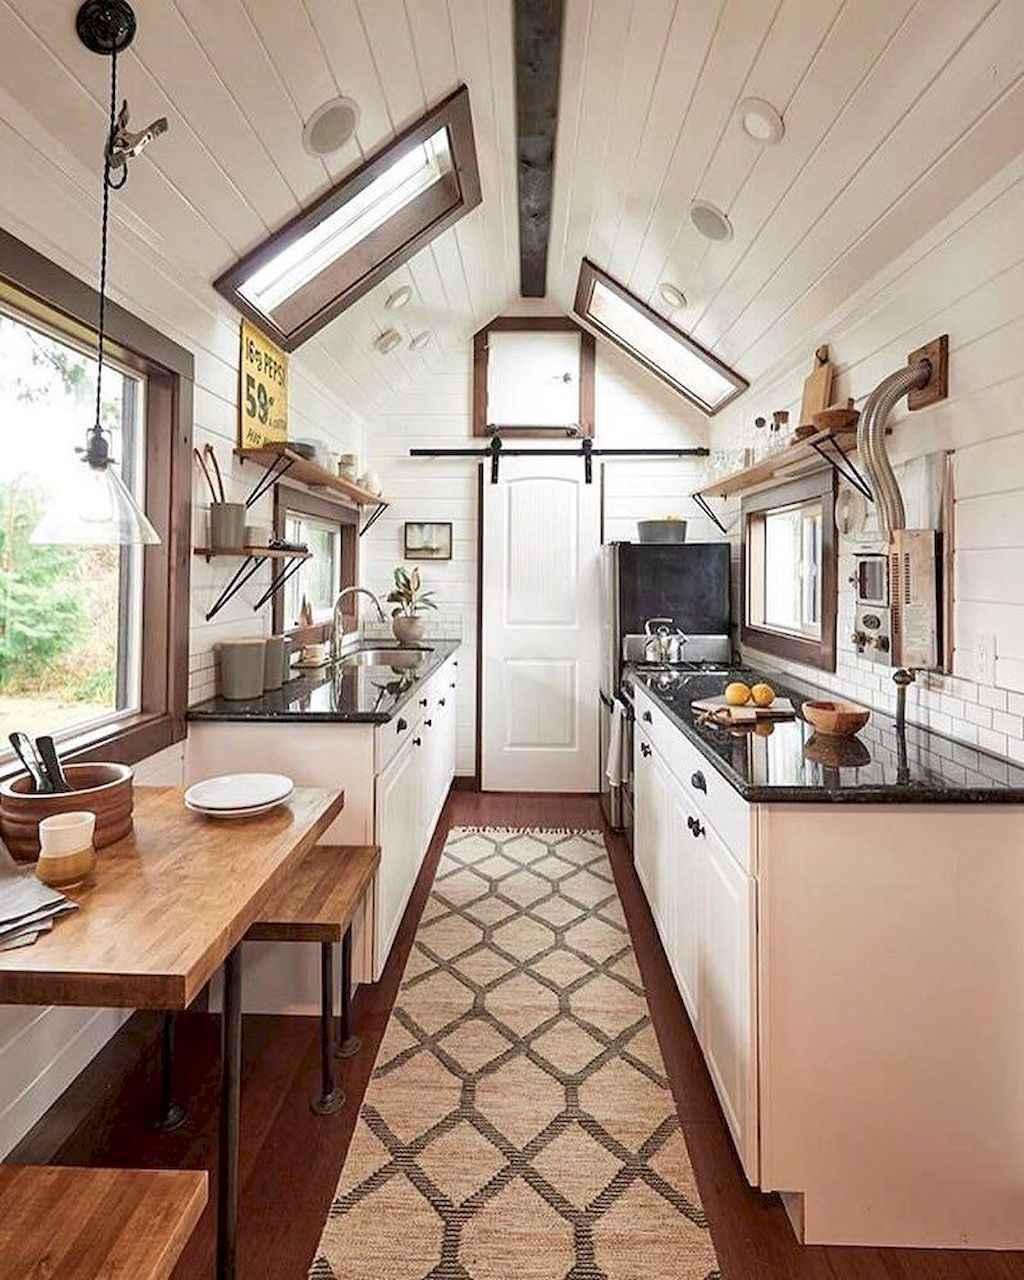 26 Tiny House Kitchen Storage Organization and Tips Ideas